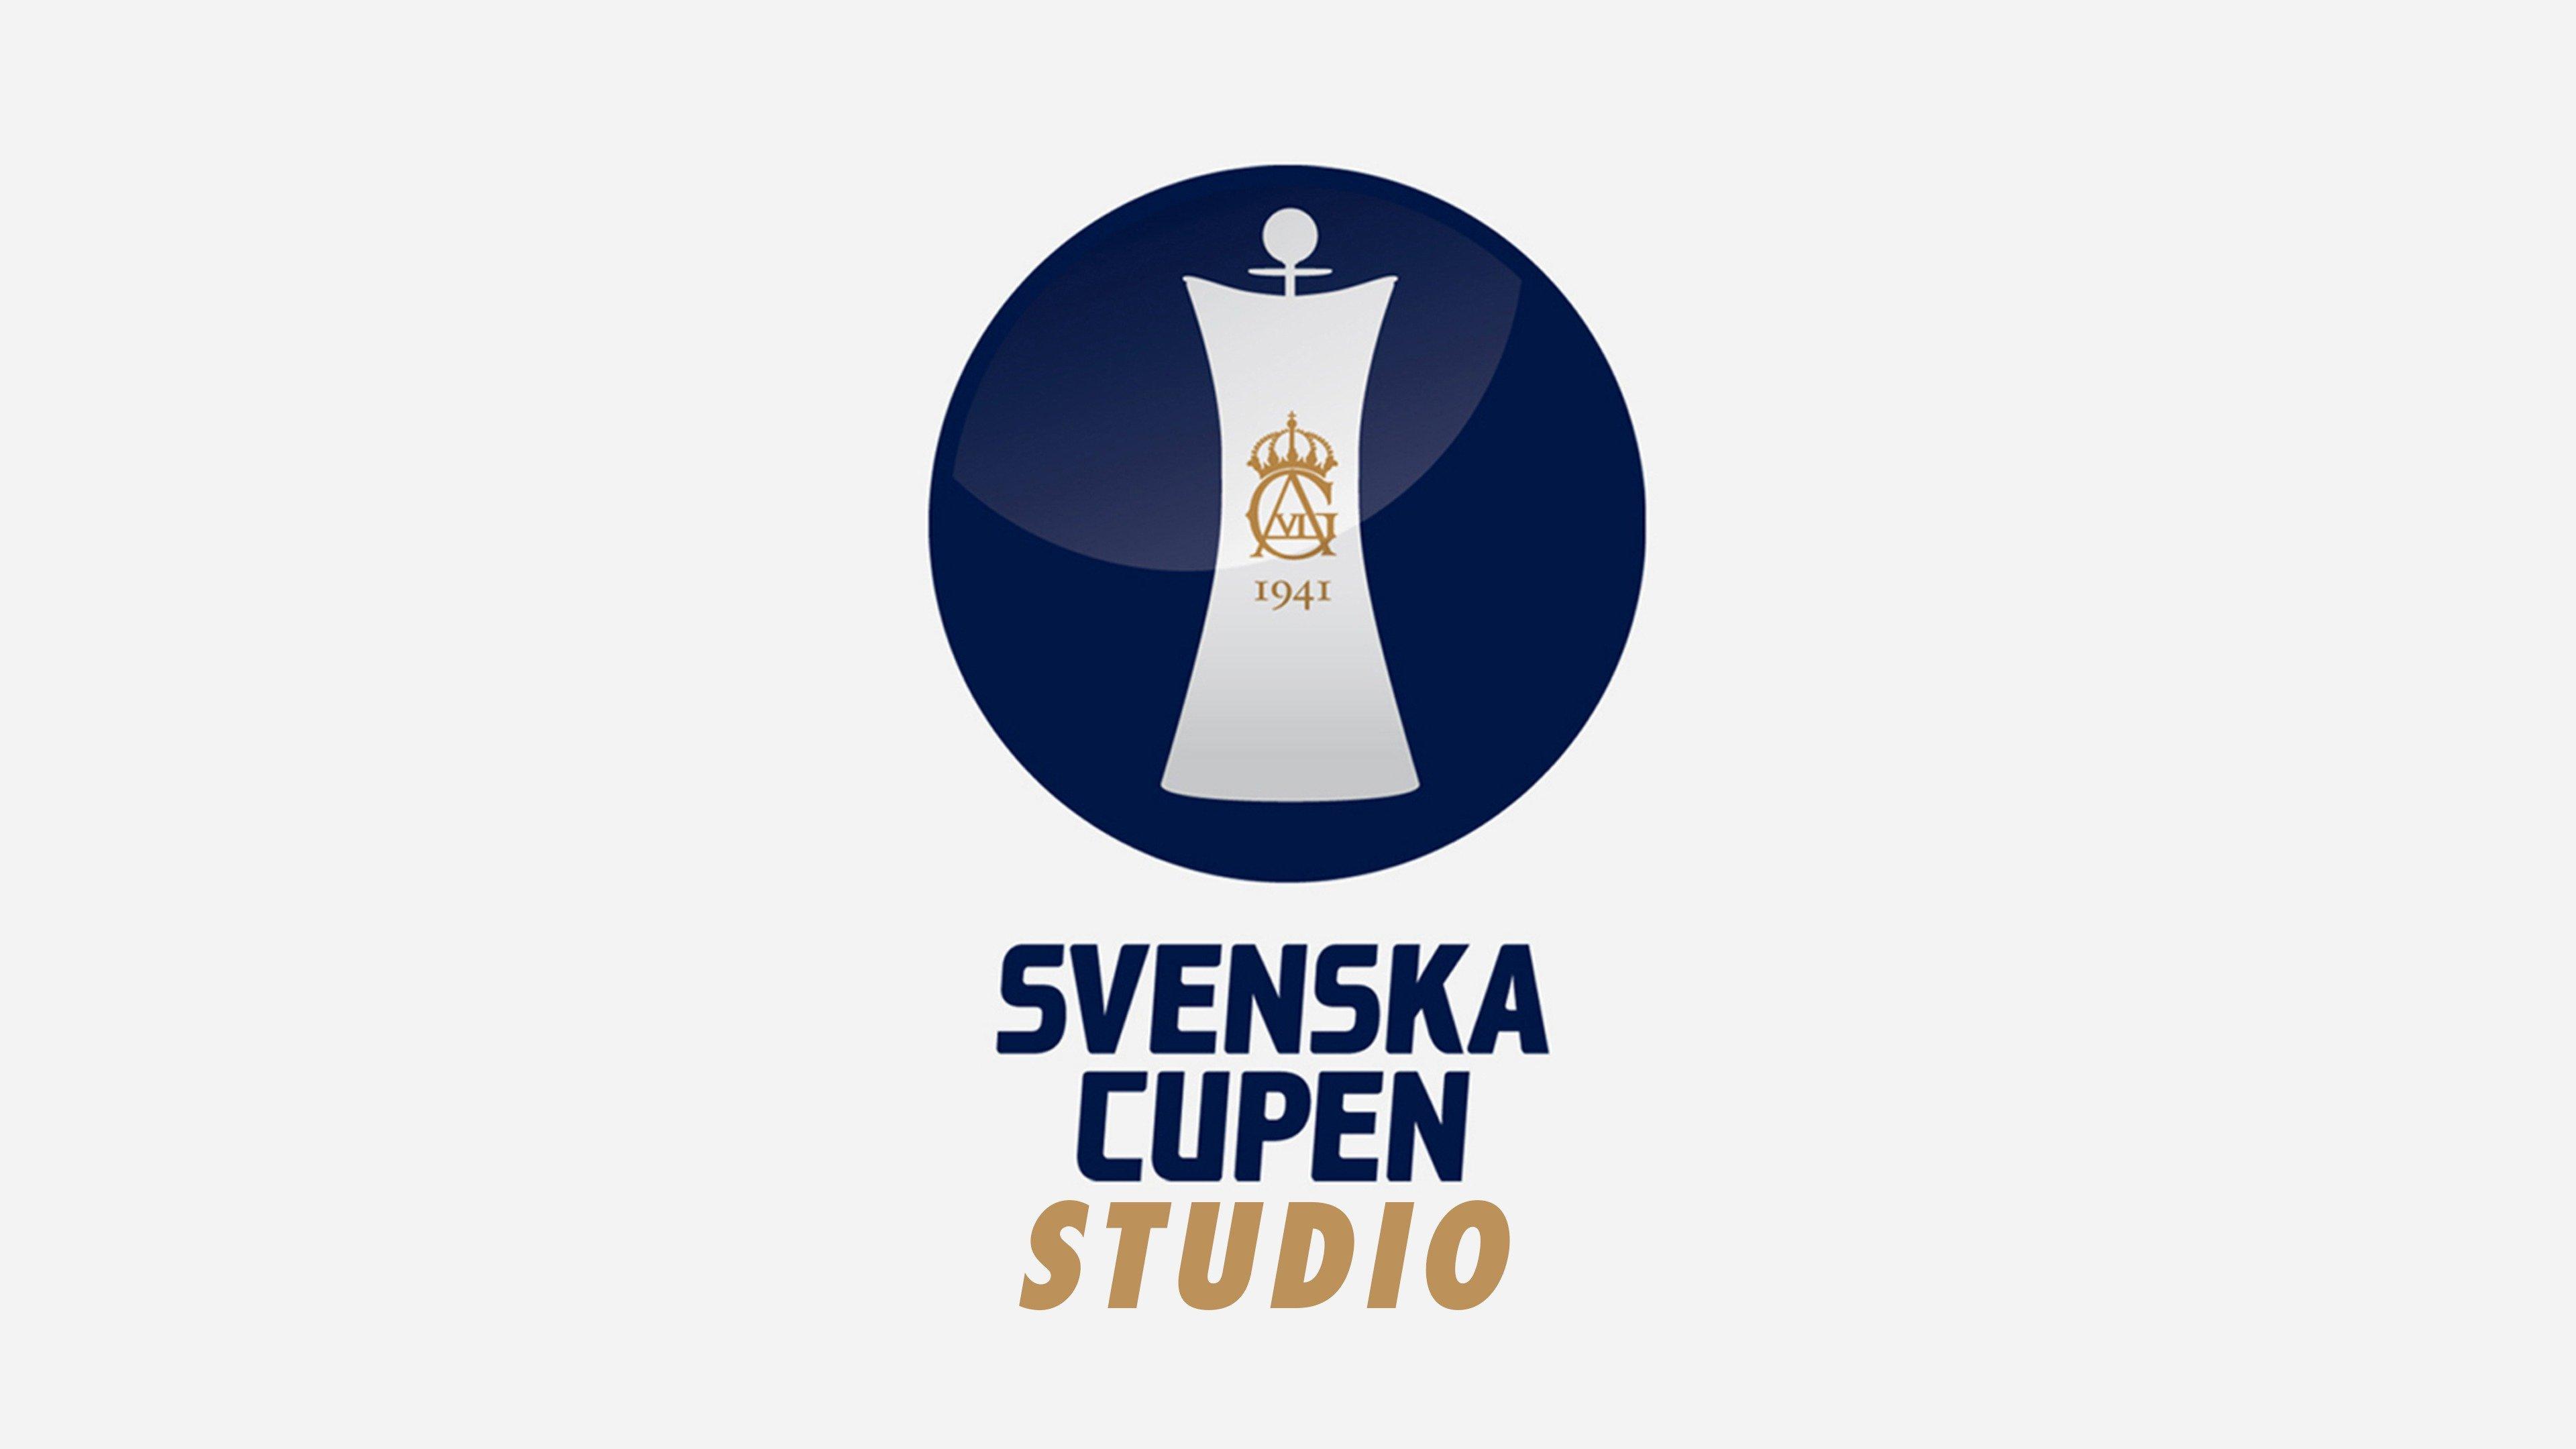 Studio Svenska cupen